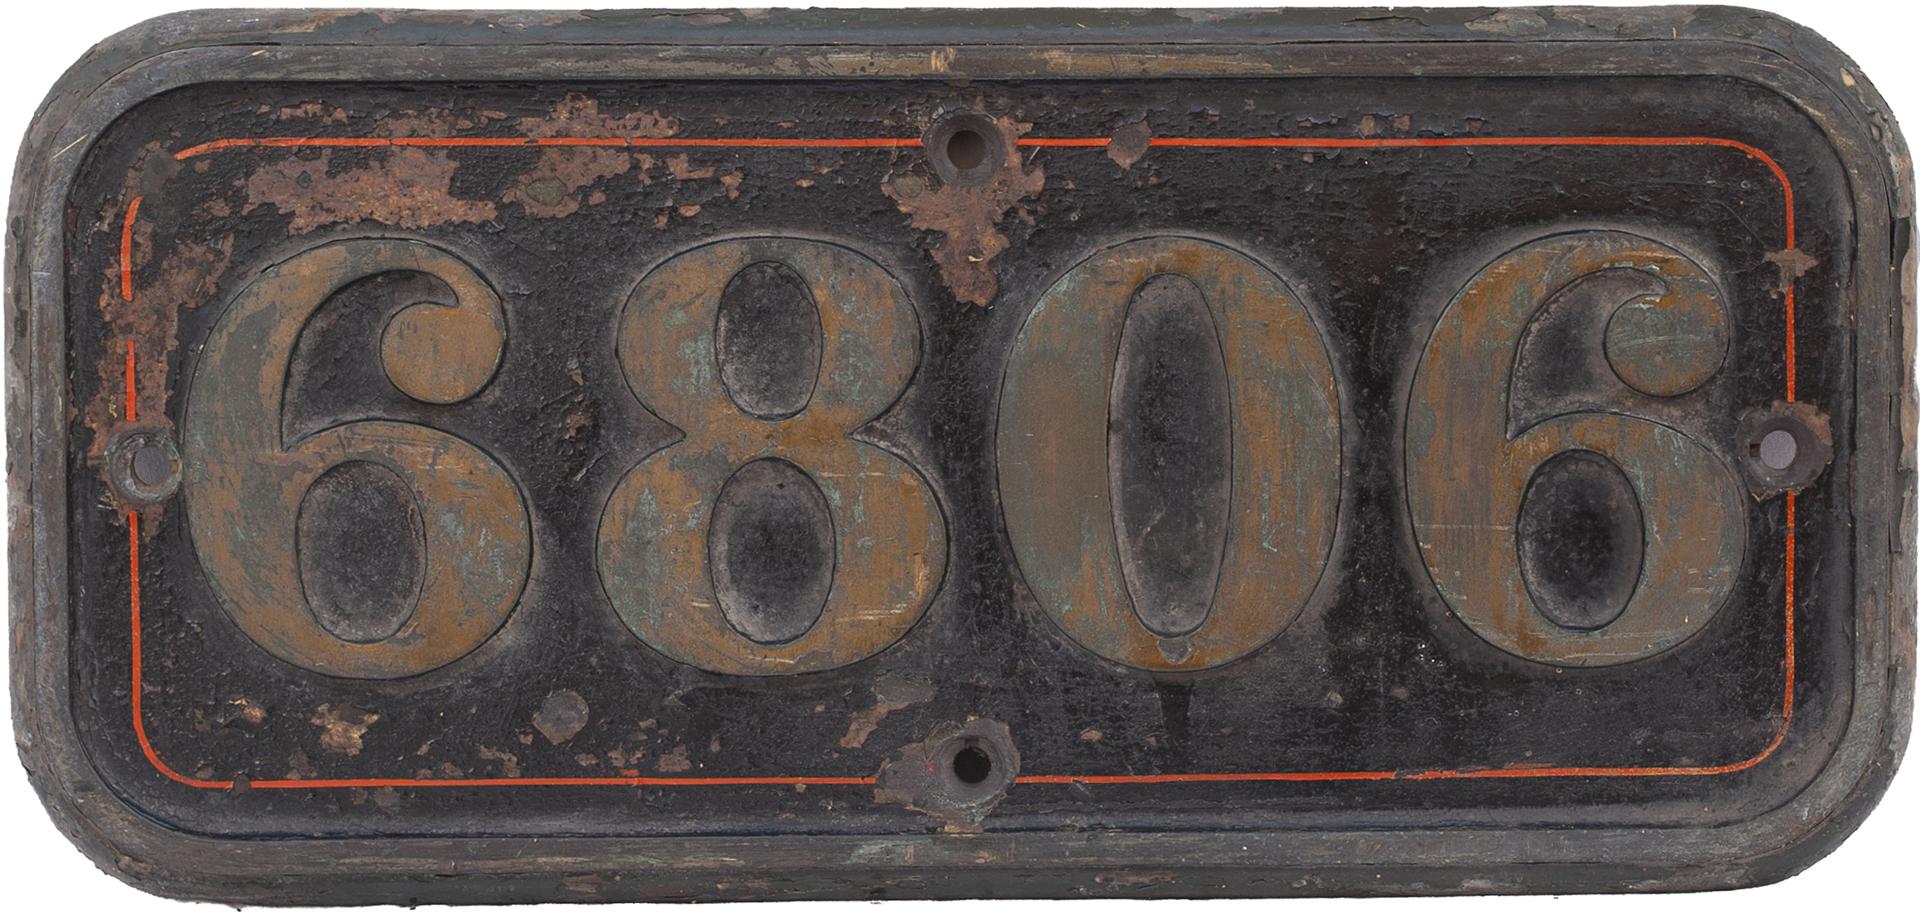 GWR brass cabside numberplate 6806 ex Collett Grange class 4-6-0 named Blackwell Grange. In original